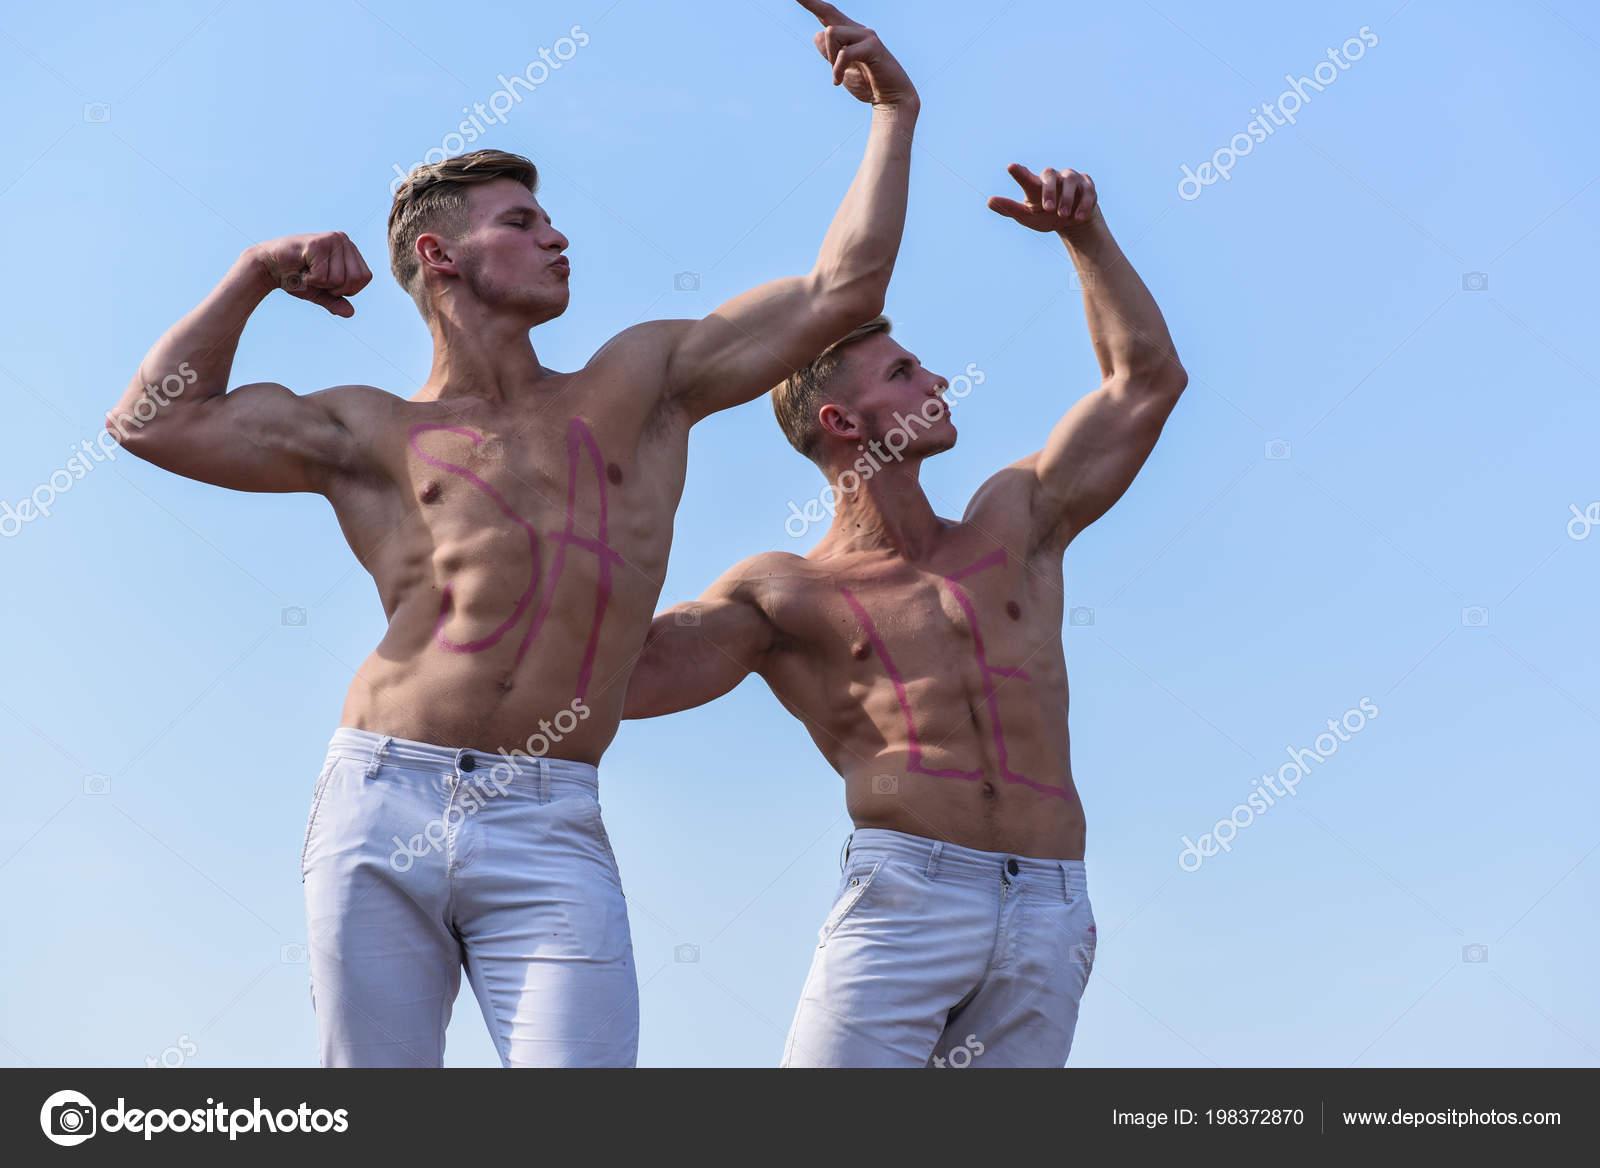 Aneta corsaut lesbian